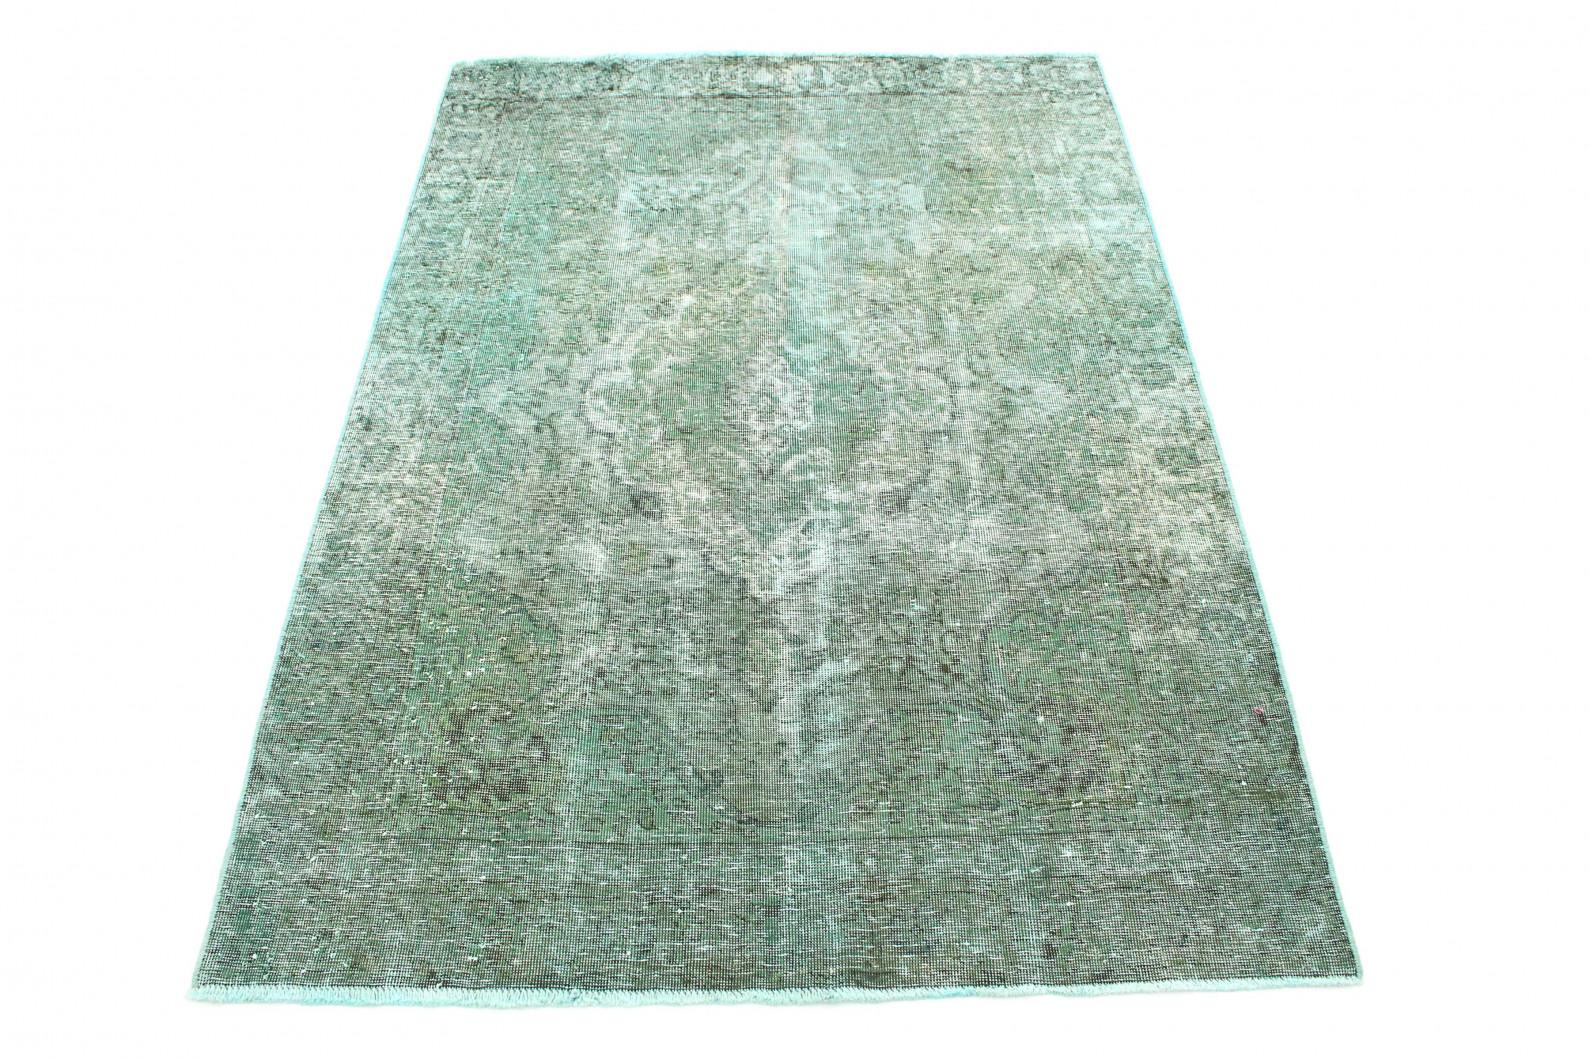 Vintage Teppich Türkis Grau in 190x130 (1 / 6)